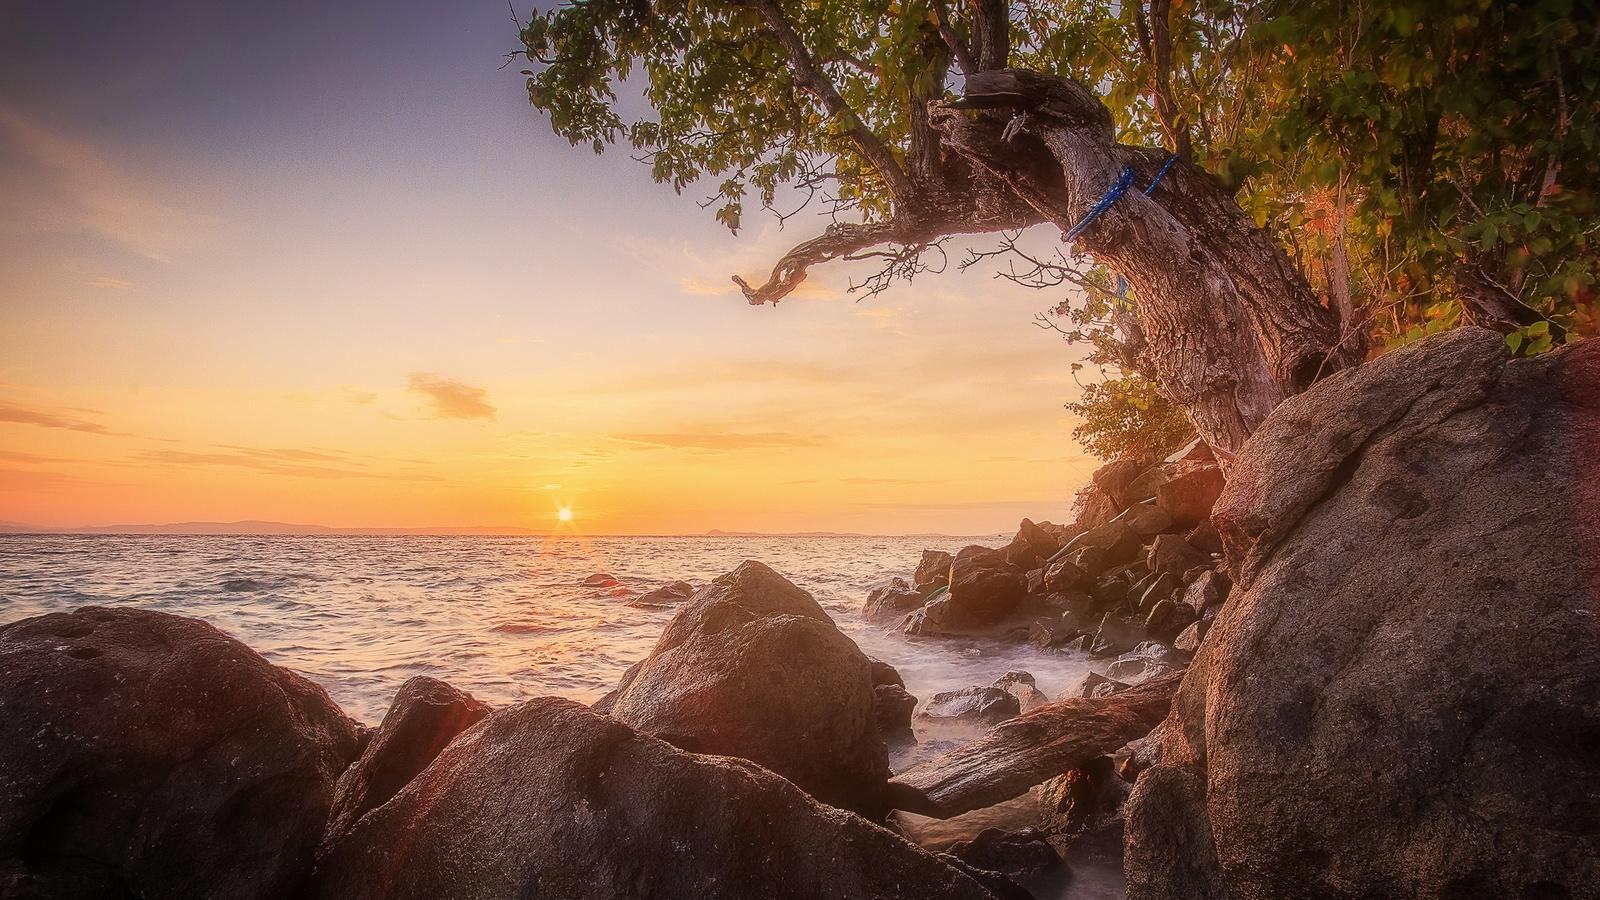 wolfgang moritzer, пейзаж, природа, индонезия, море, берег, камни, дерево, закат